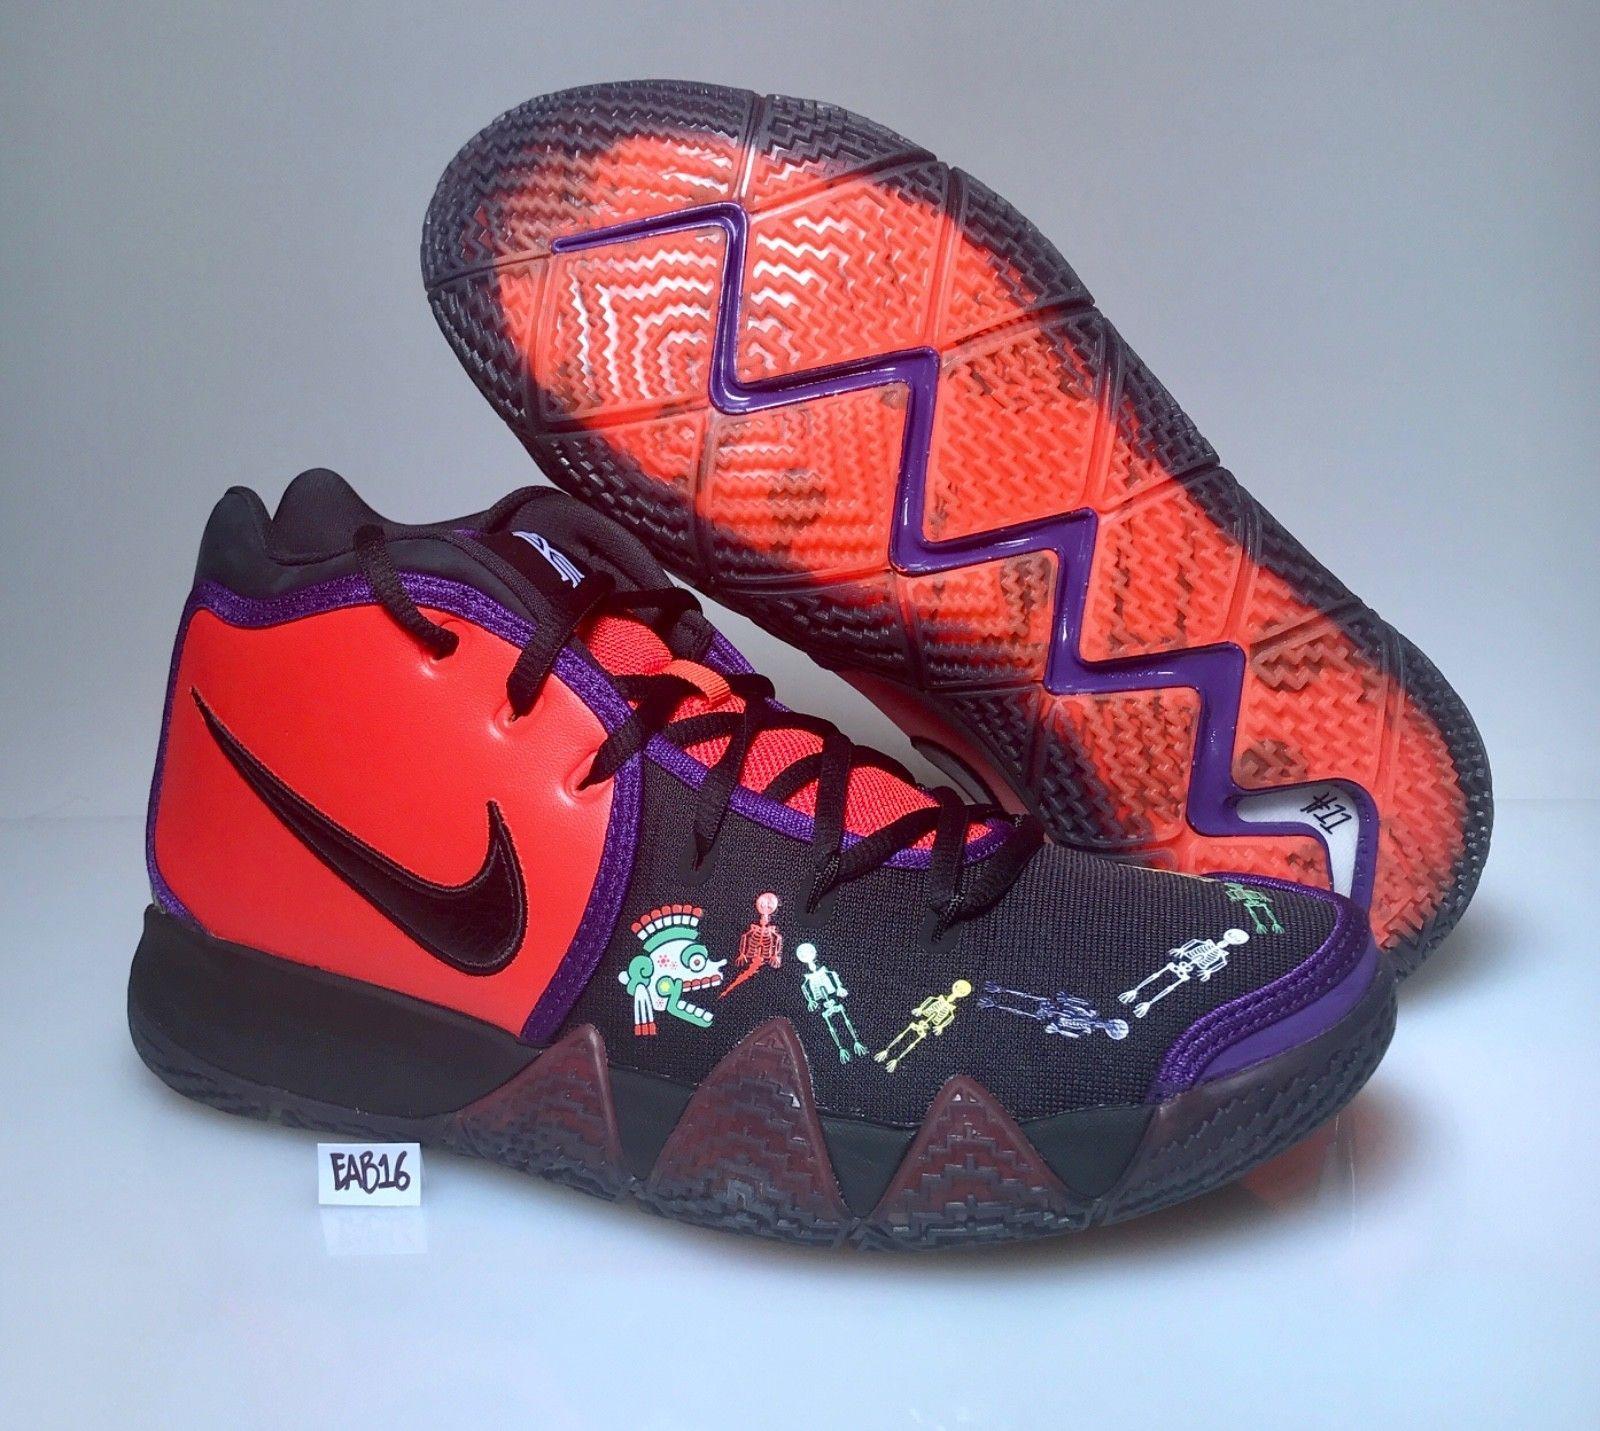 2aa5827d5fc Nike Kyrie Irving 4 IV Day Of The Dead DOTD TV PE 1 Team Orange Black CI0278 -800